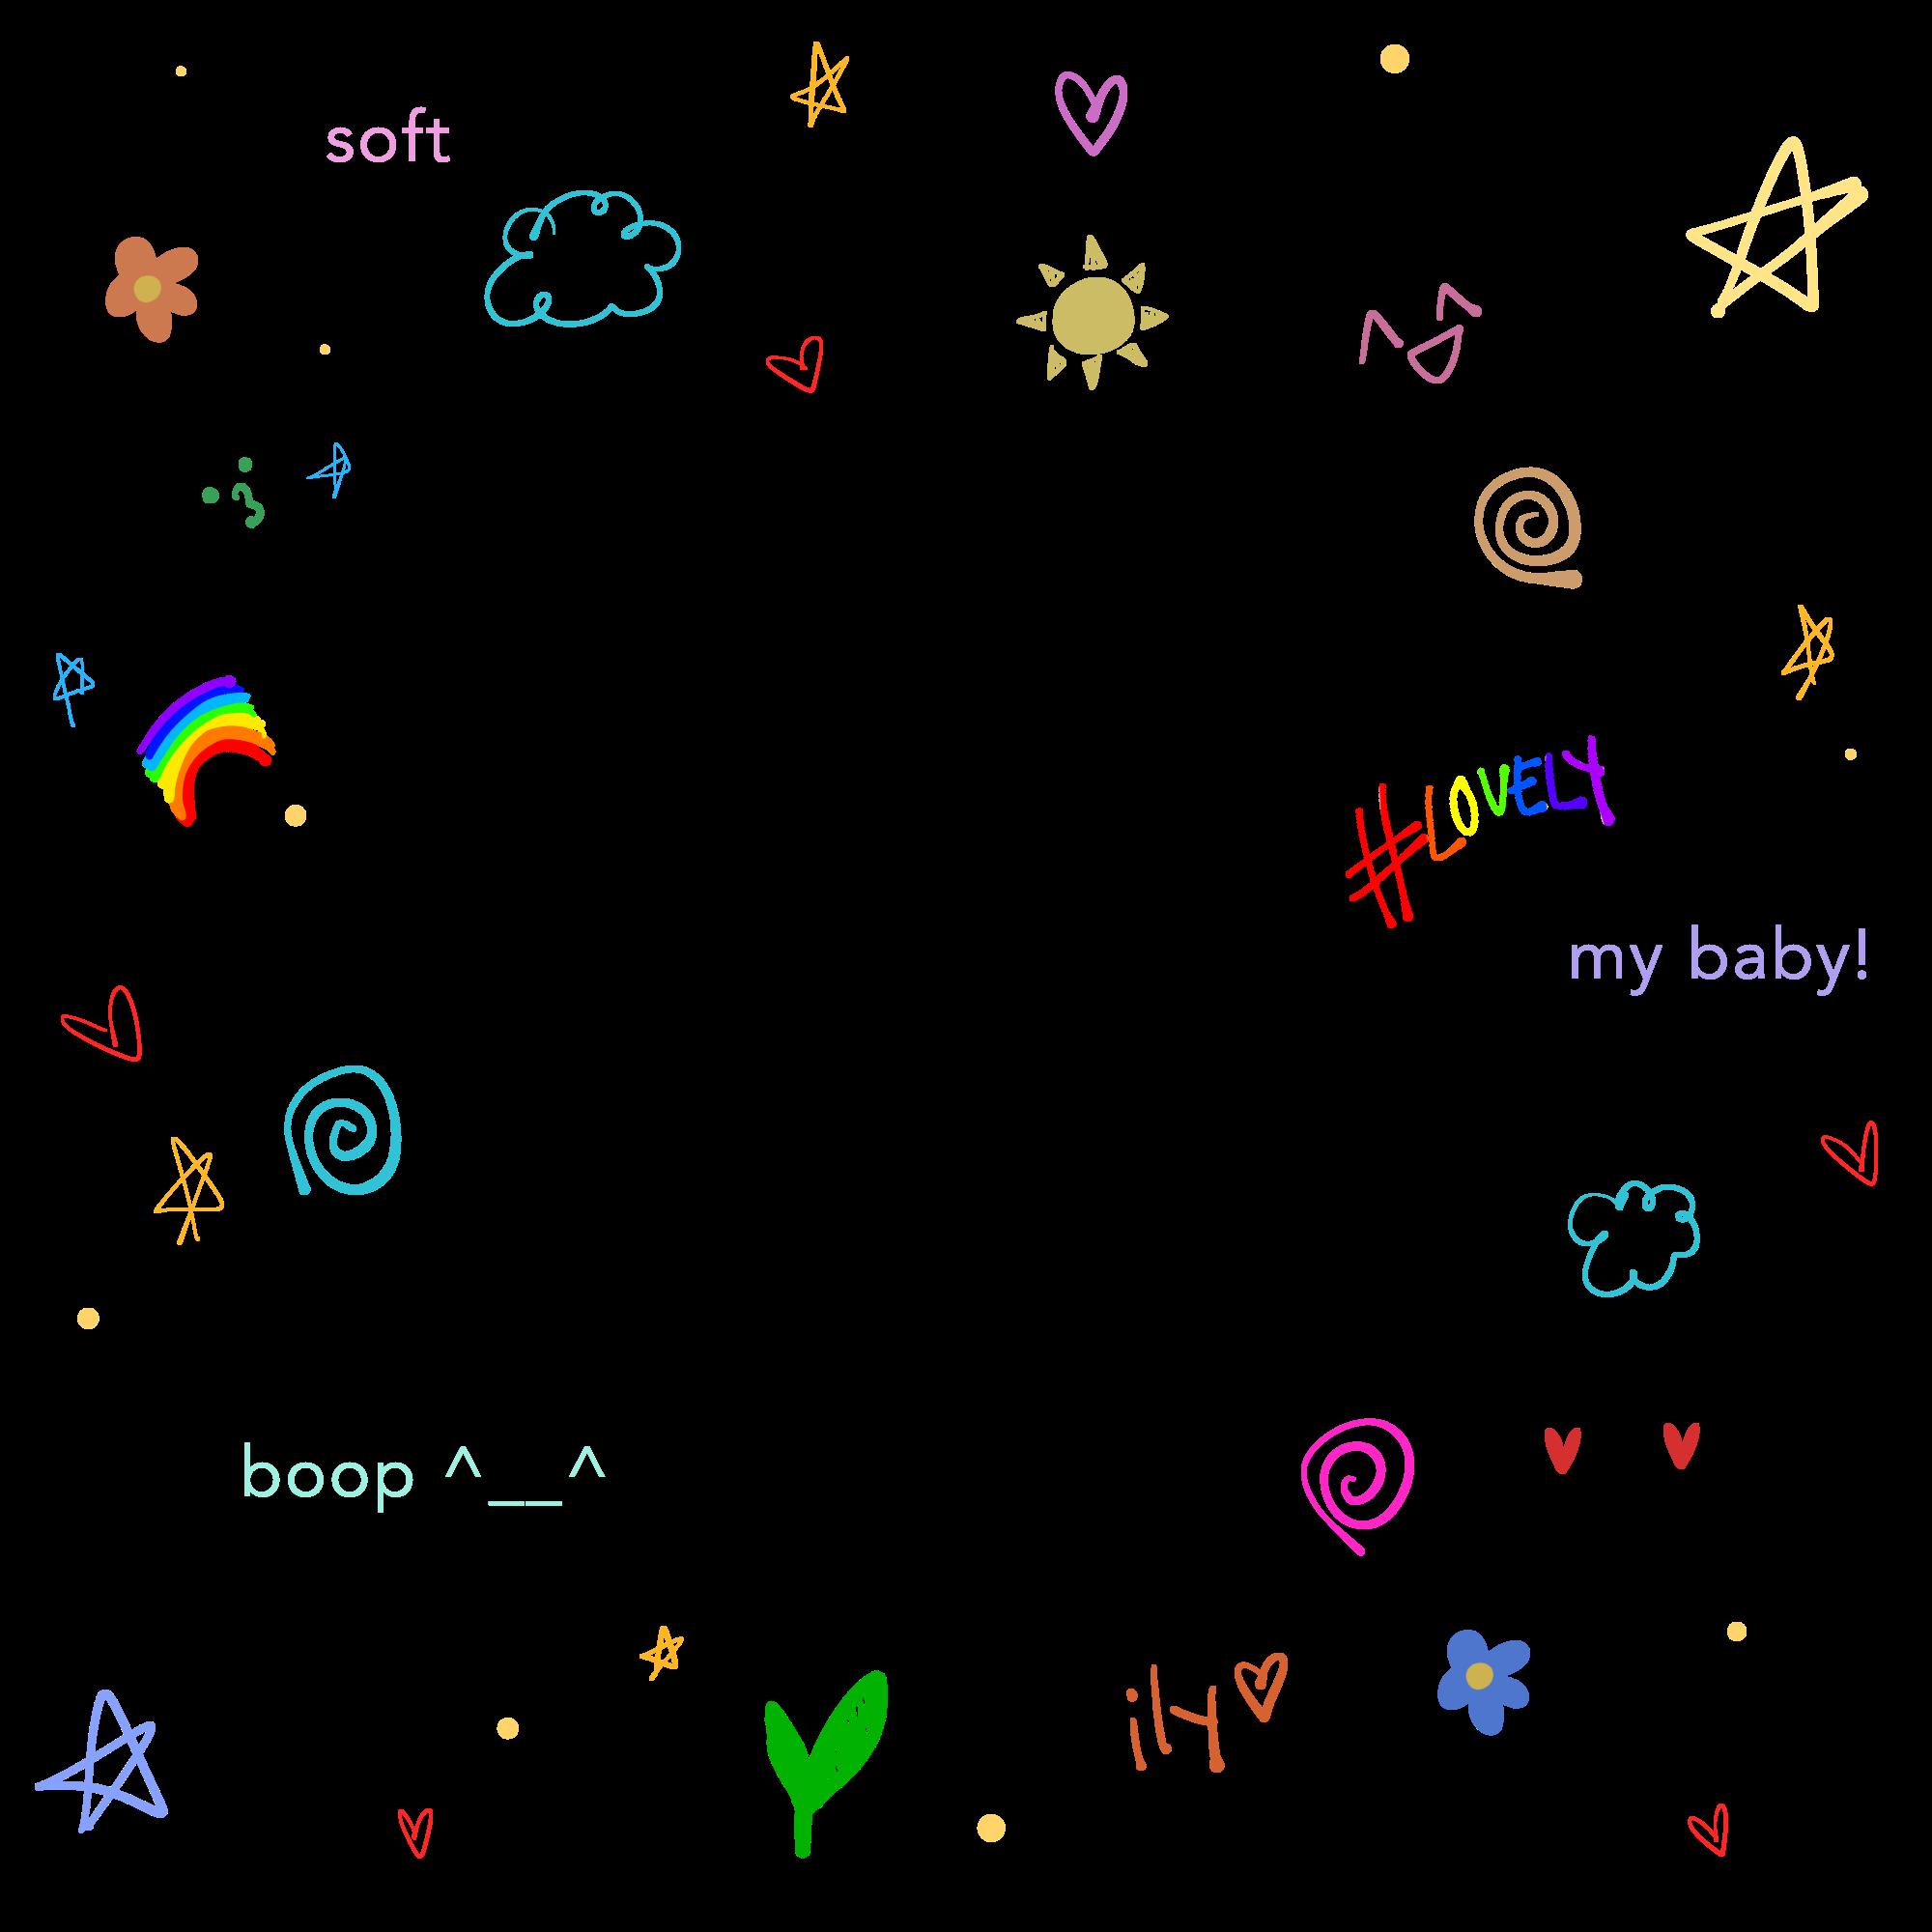 Soft Aesthetic Cute Softedit Edit Kawaii Kpop Border Messy Cyber Doodle Frame Freetoedit Remixit Desain Pamflet Seni Buku Kartu Kertas